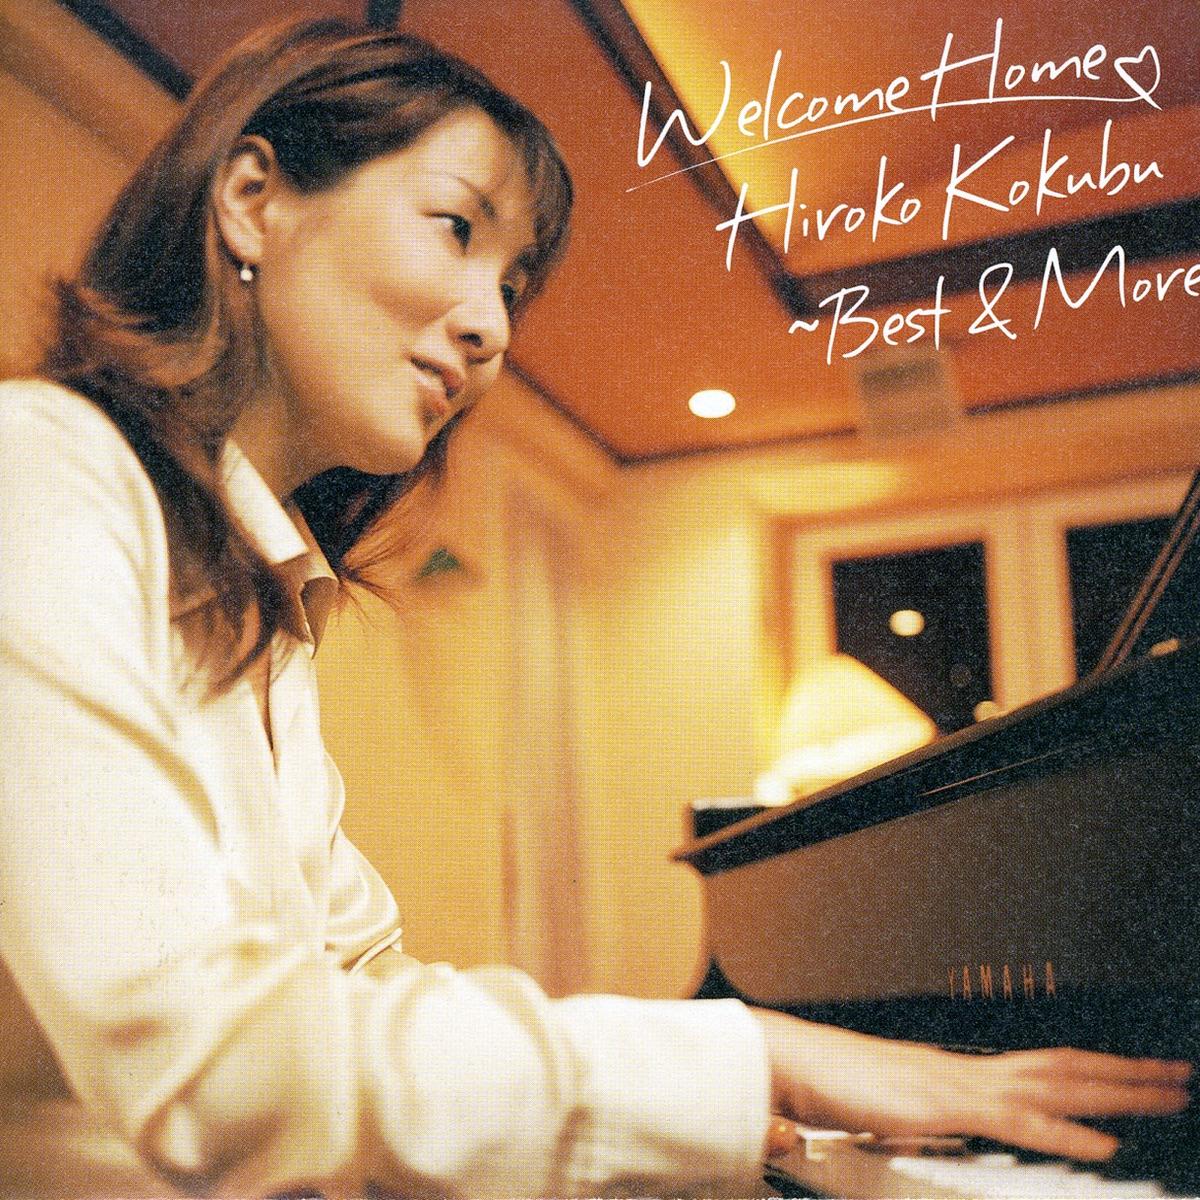 Welcome Home Hiroko Kokubu CD cover